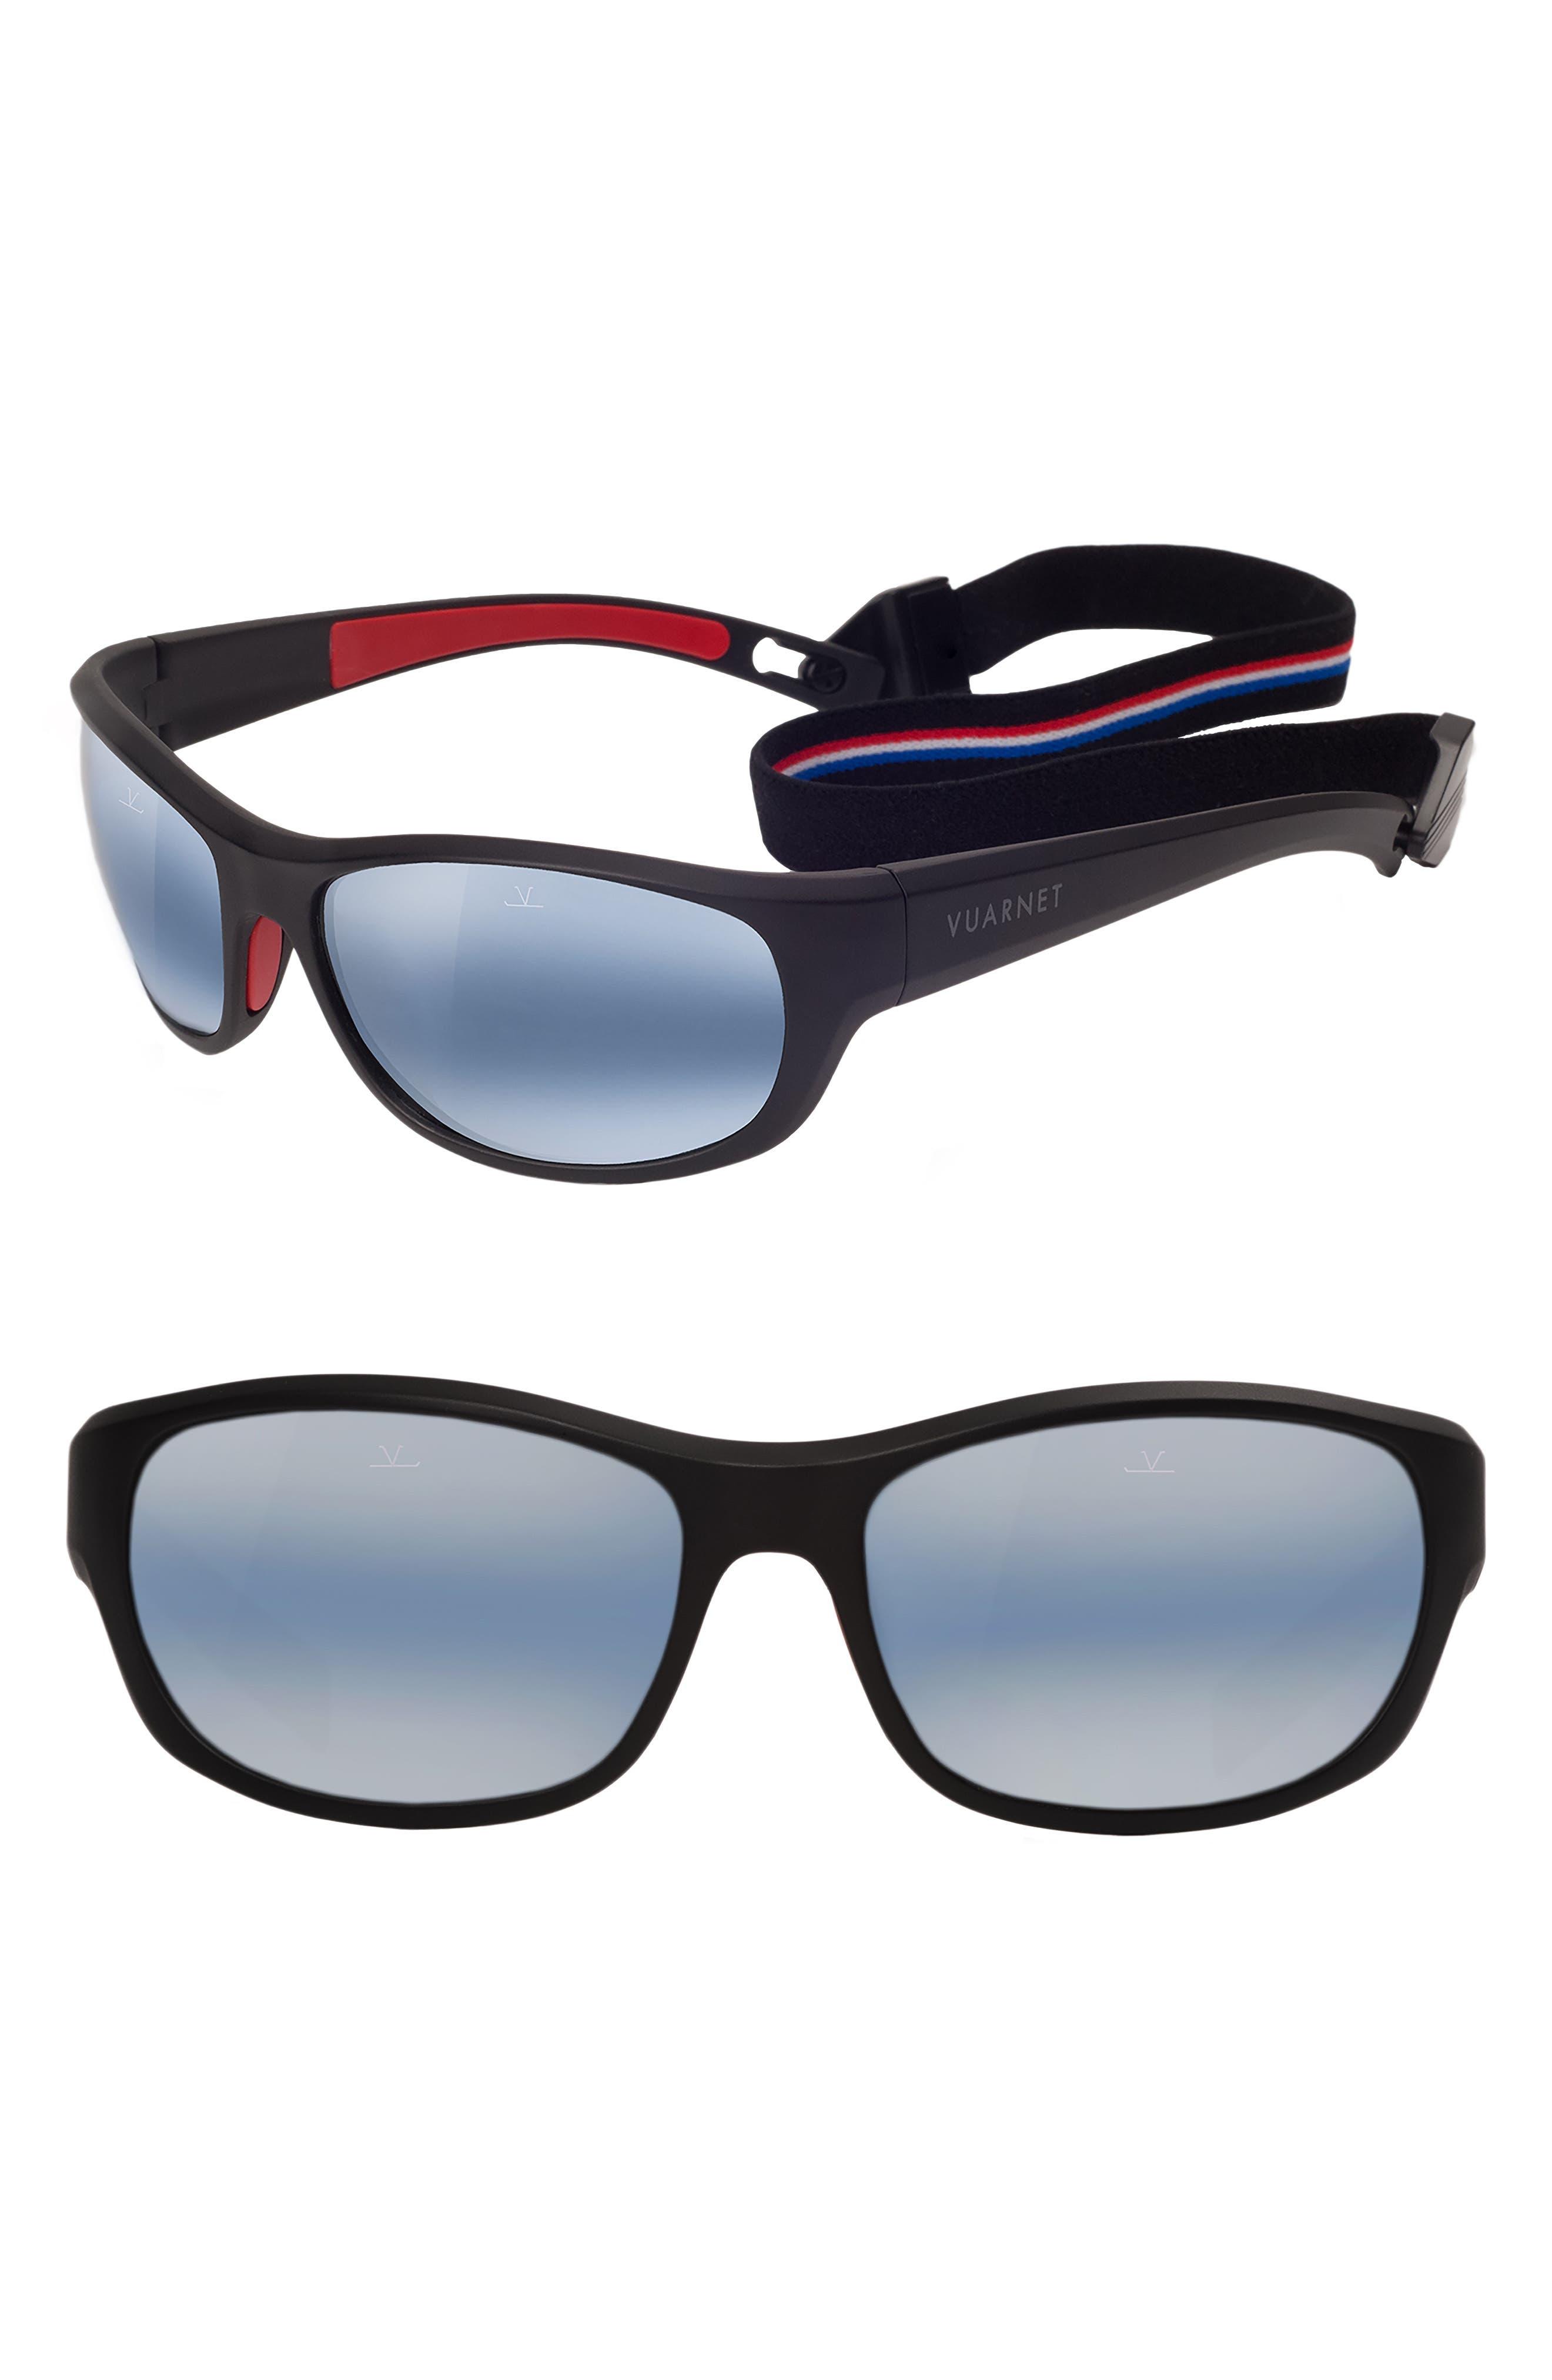 Medium Cup 62mm Polarized Sunglasses,                         Main,                         color, Matt Black / Red